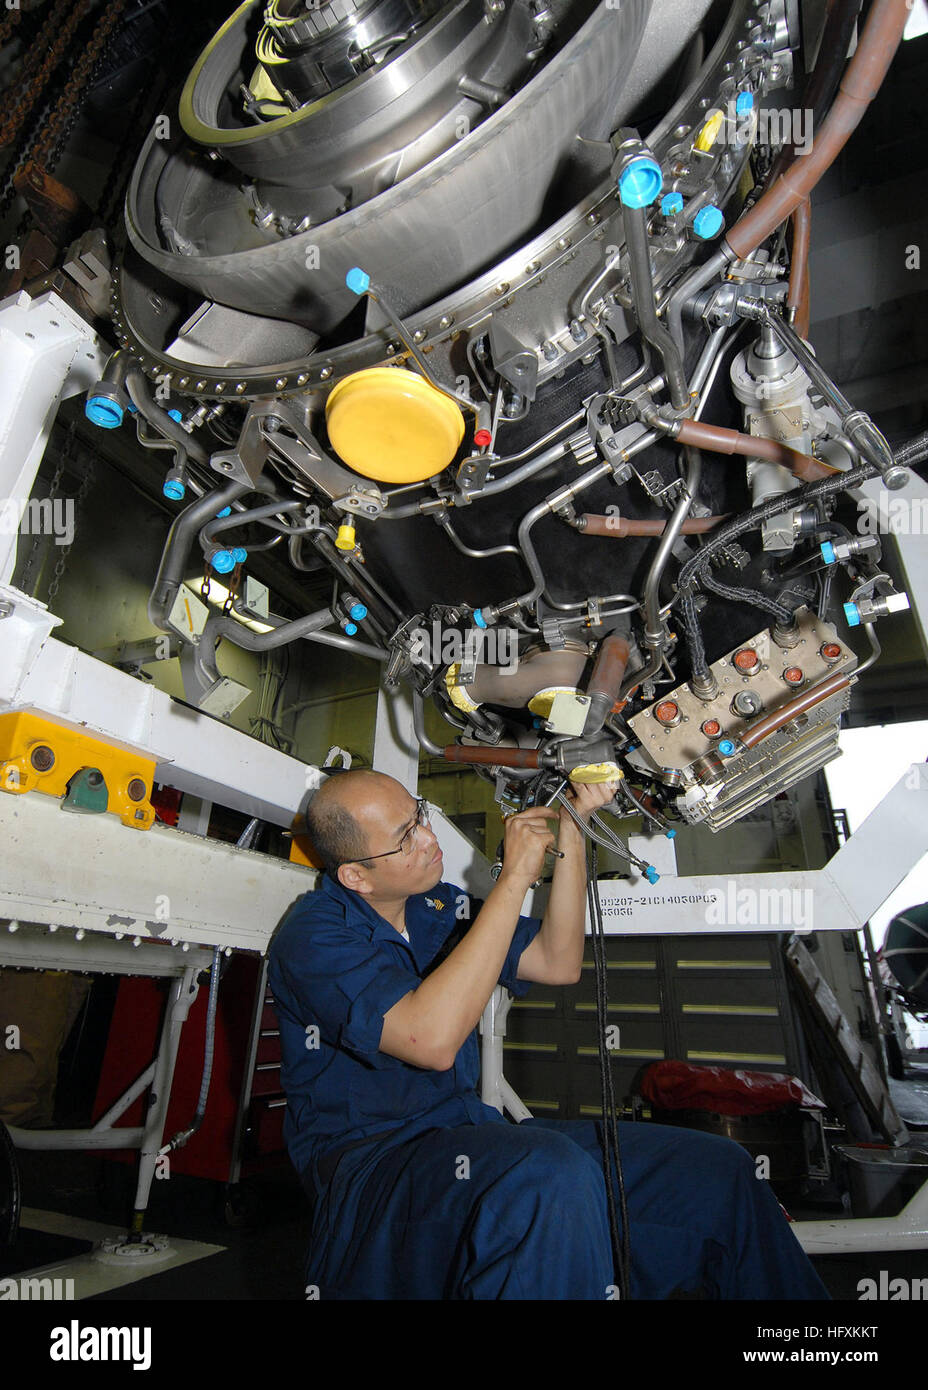 medium resolution of 090622 n 6720t 015 pacific ocean june 22 2009 aviation wiring harness